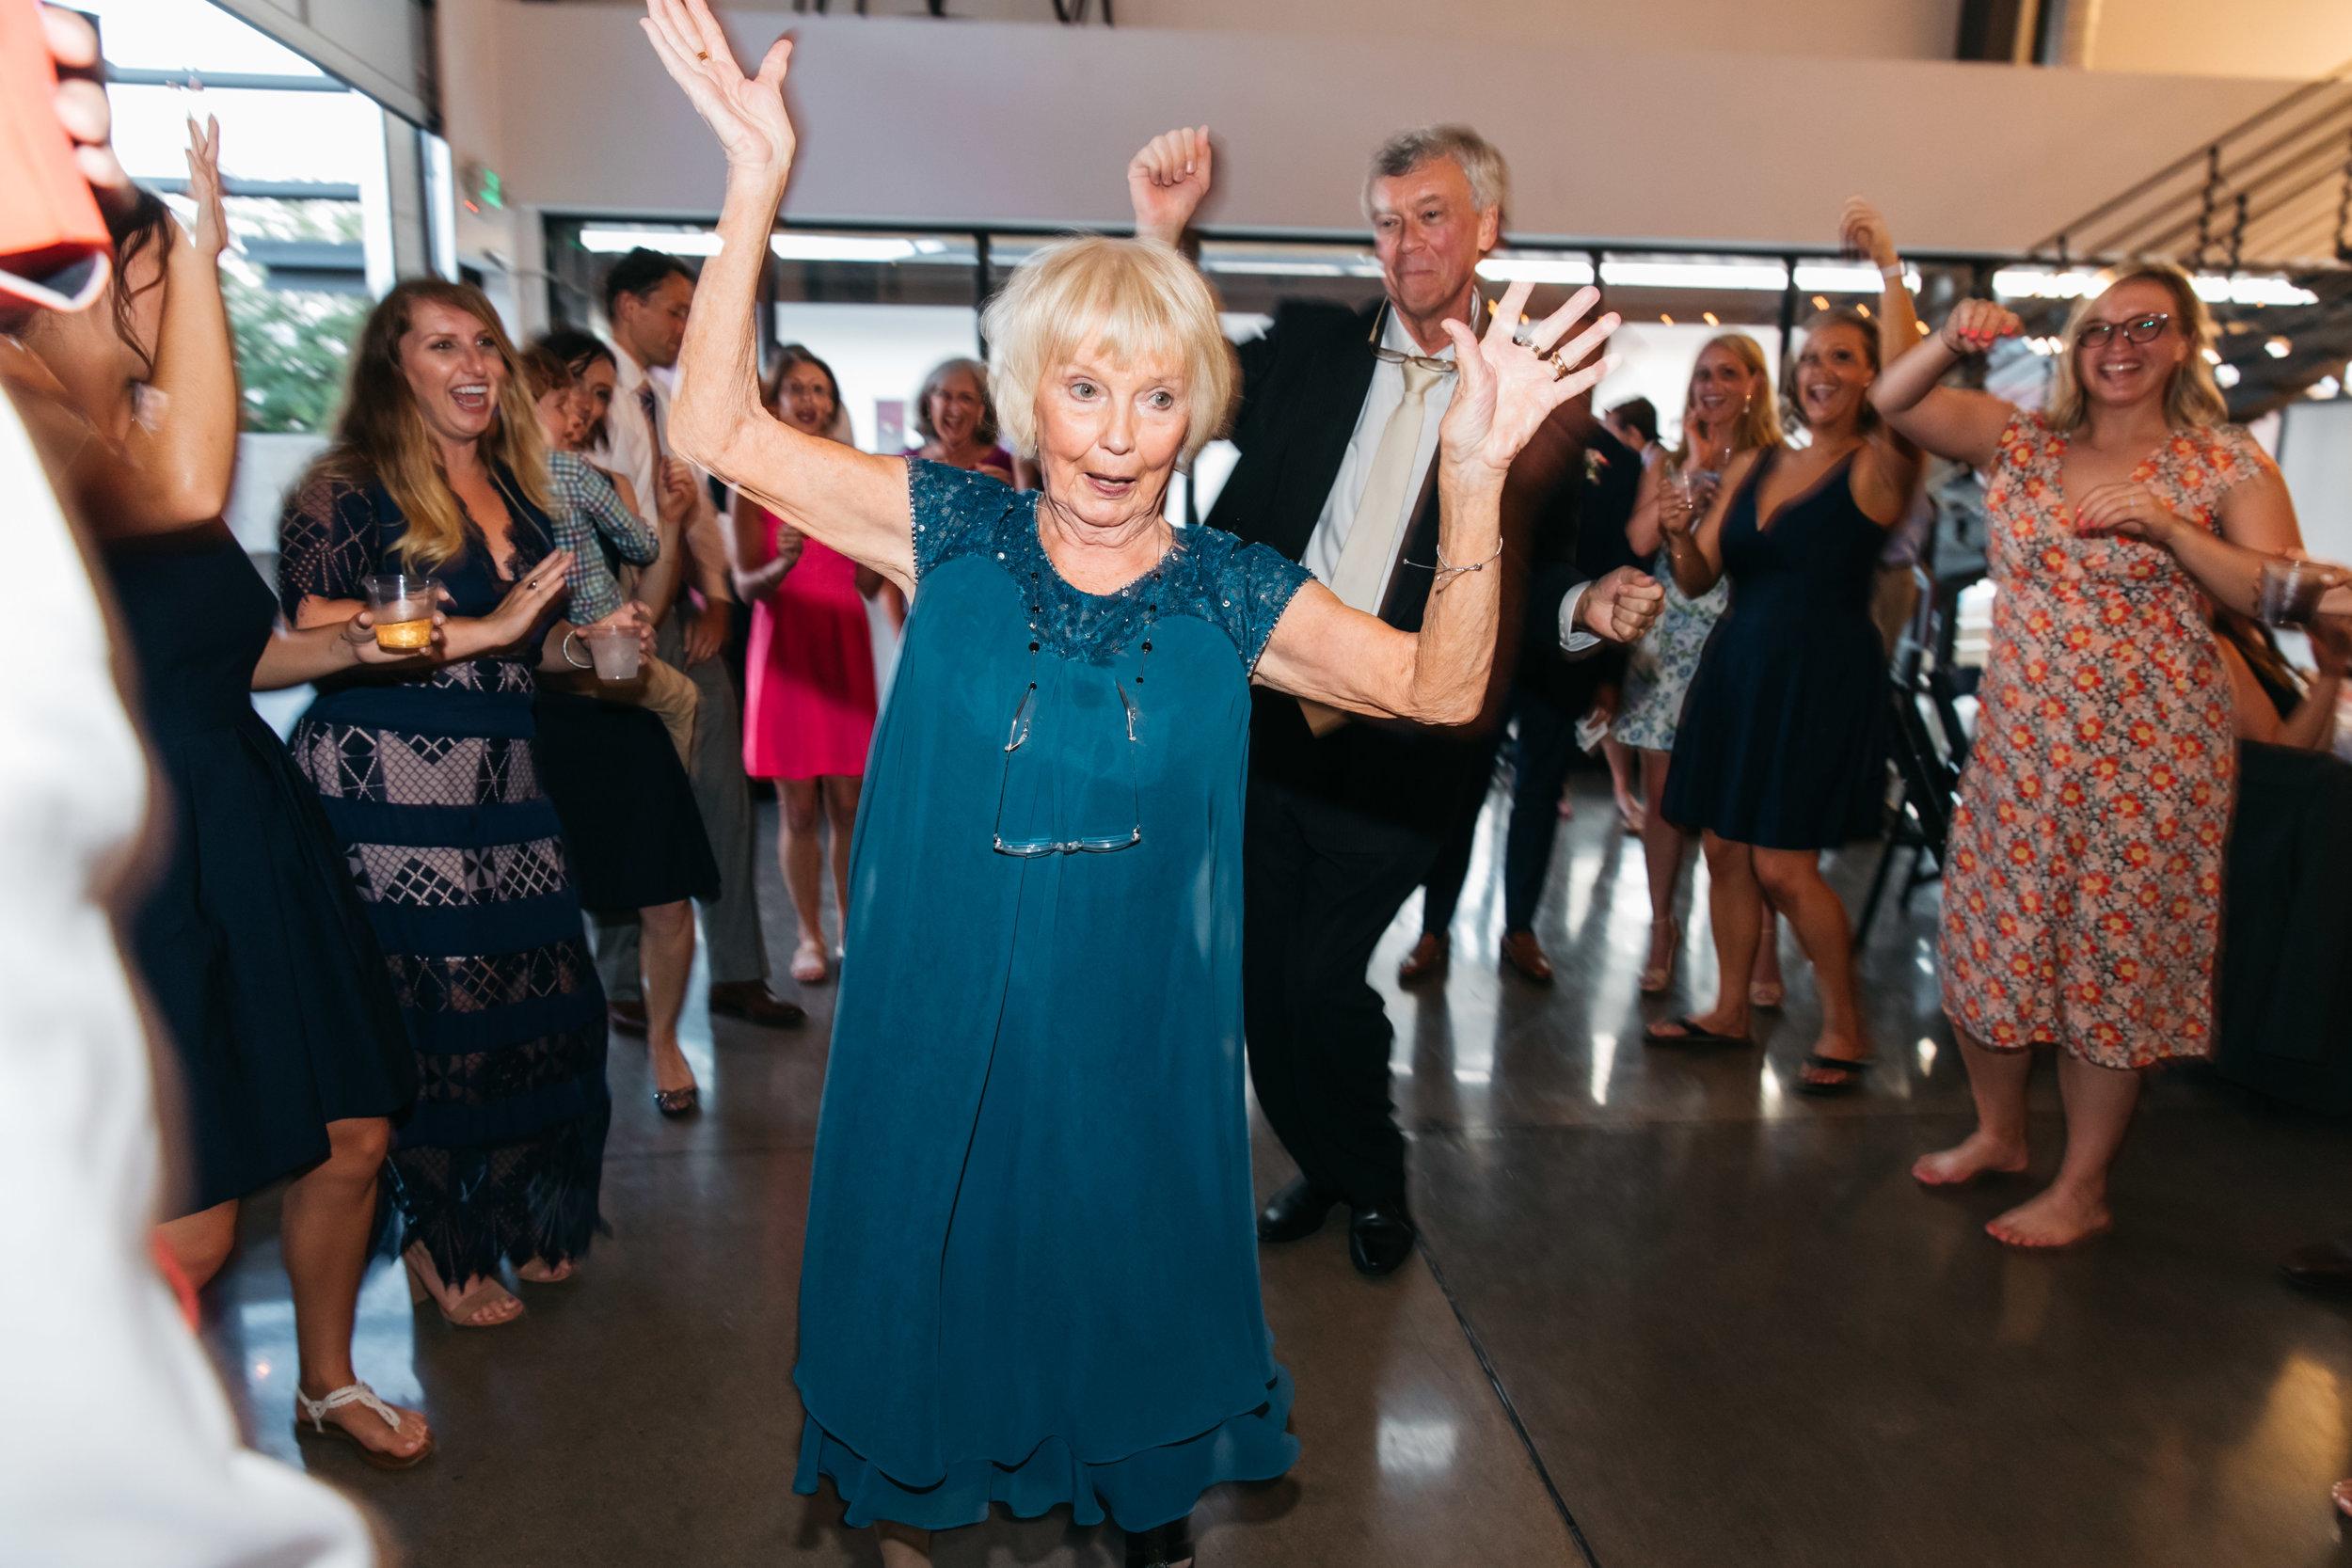 grandma wedding dance